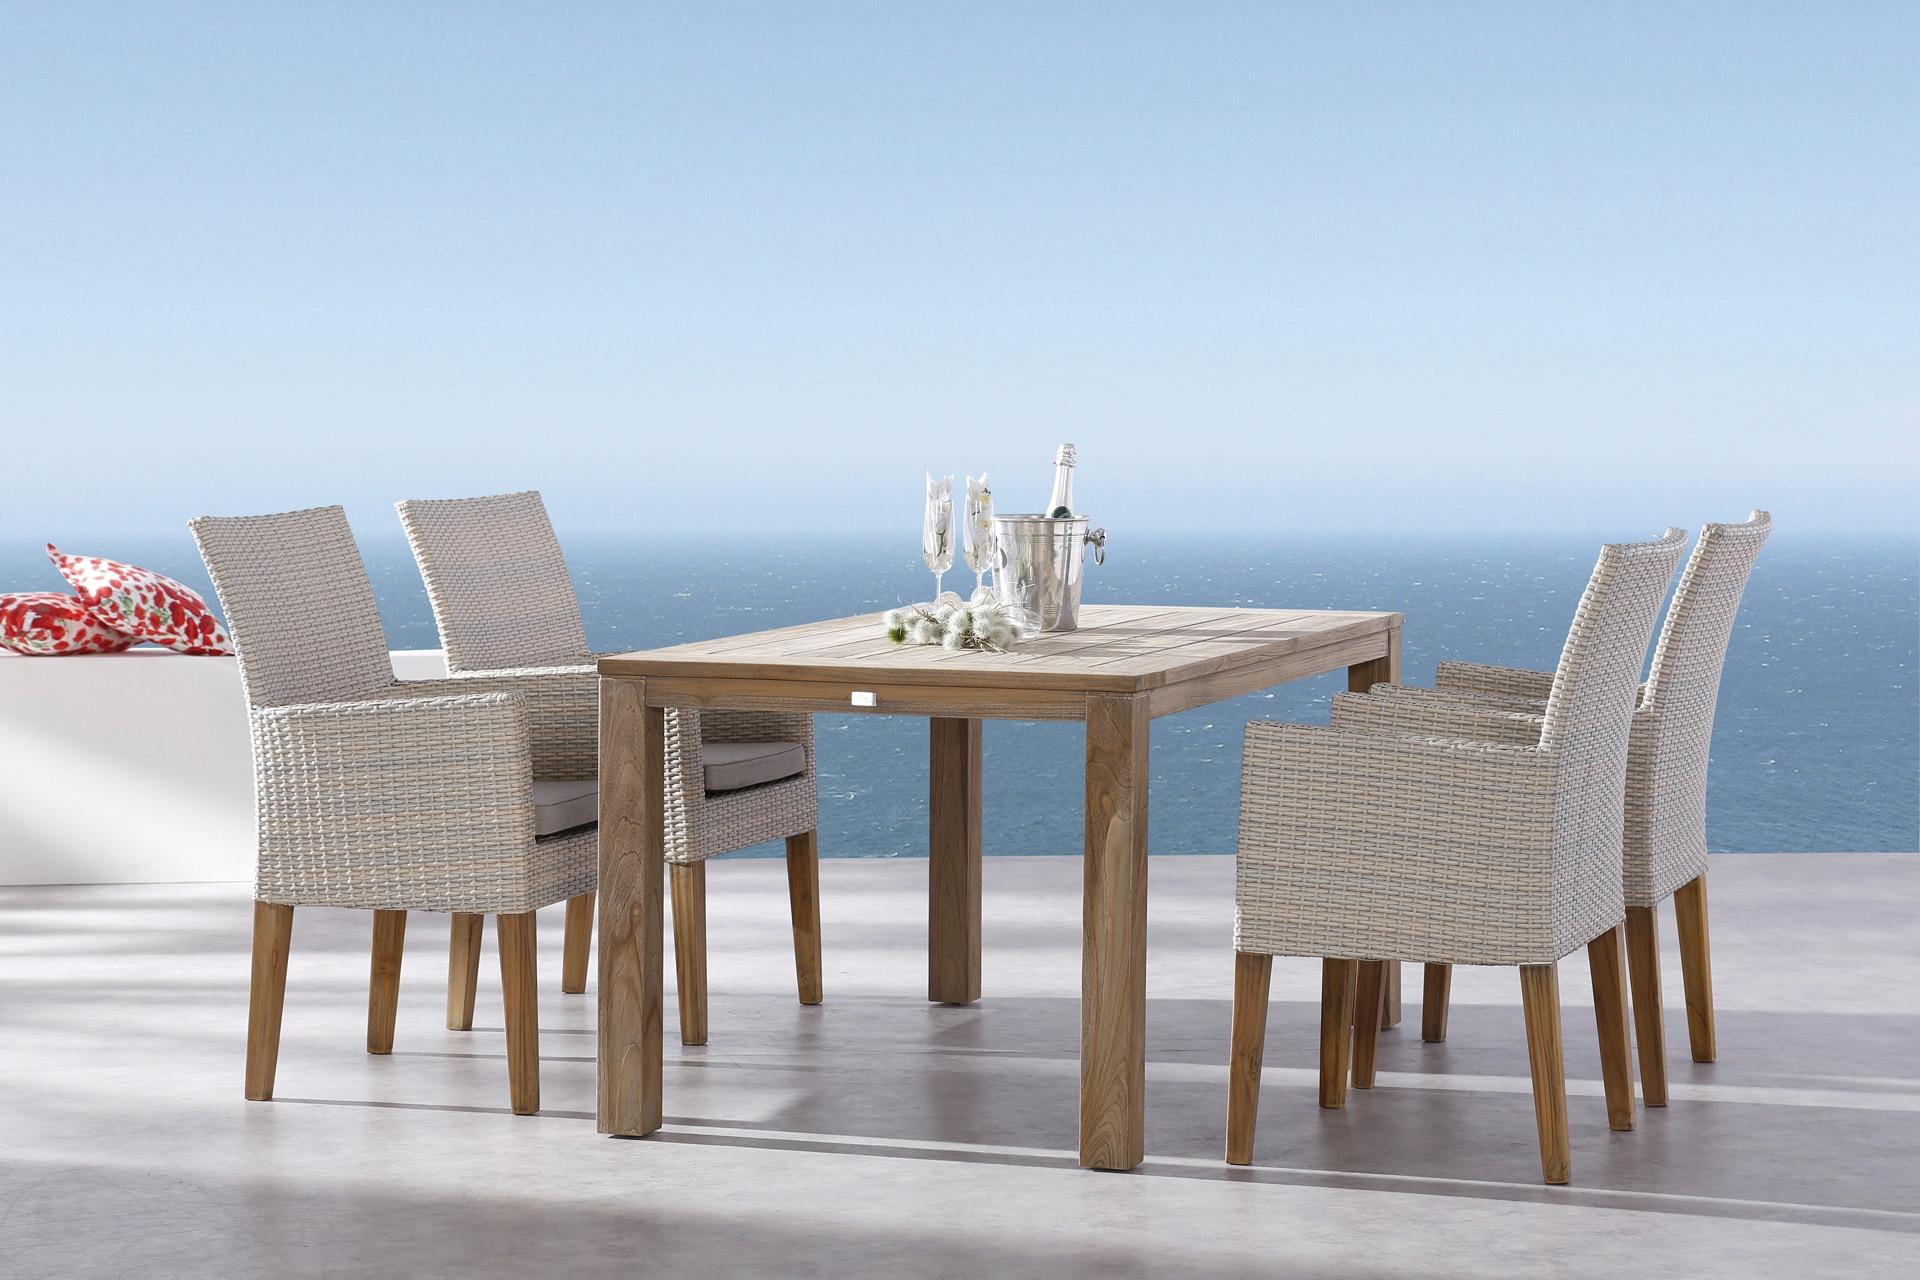 BEST Gartenmöbelset Alicante/Moretti 9-tlg 4 Sessel Tisch 160x90 cm Teak inkl Auflage